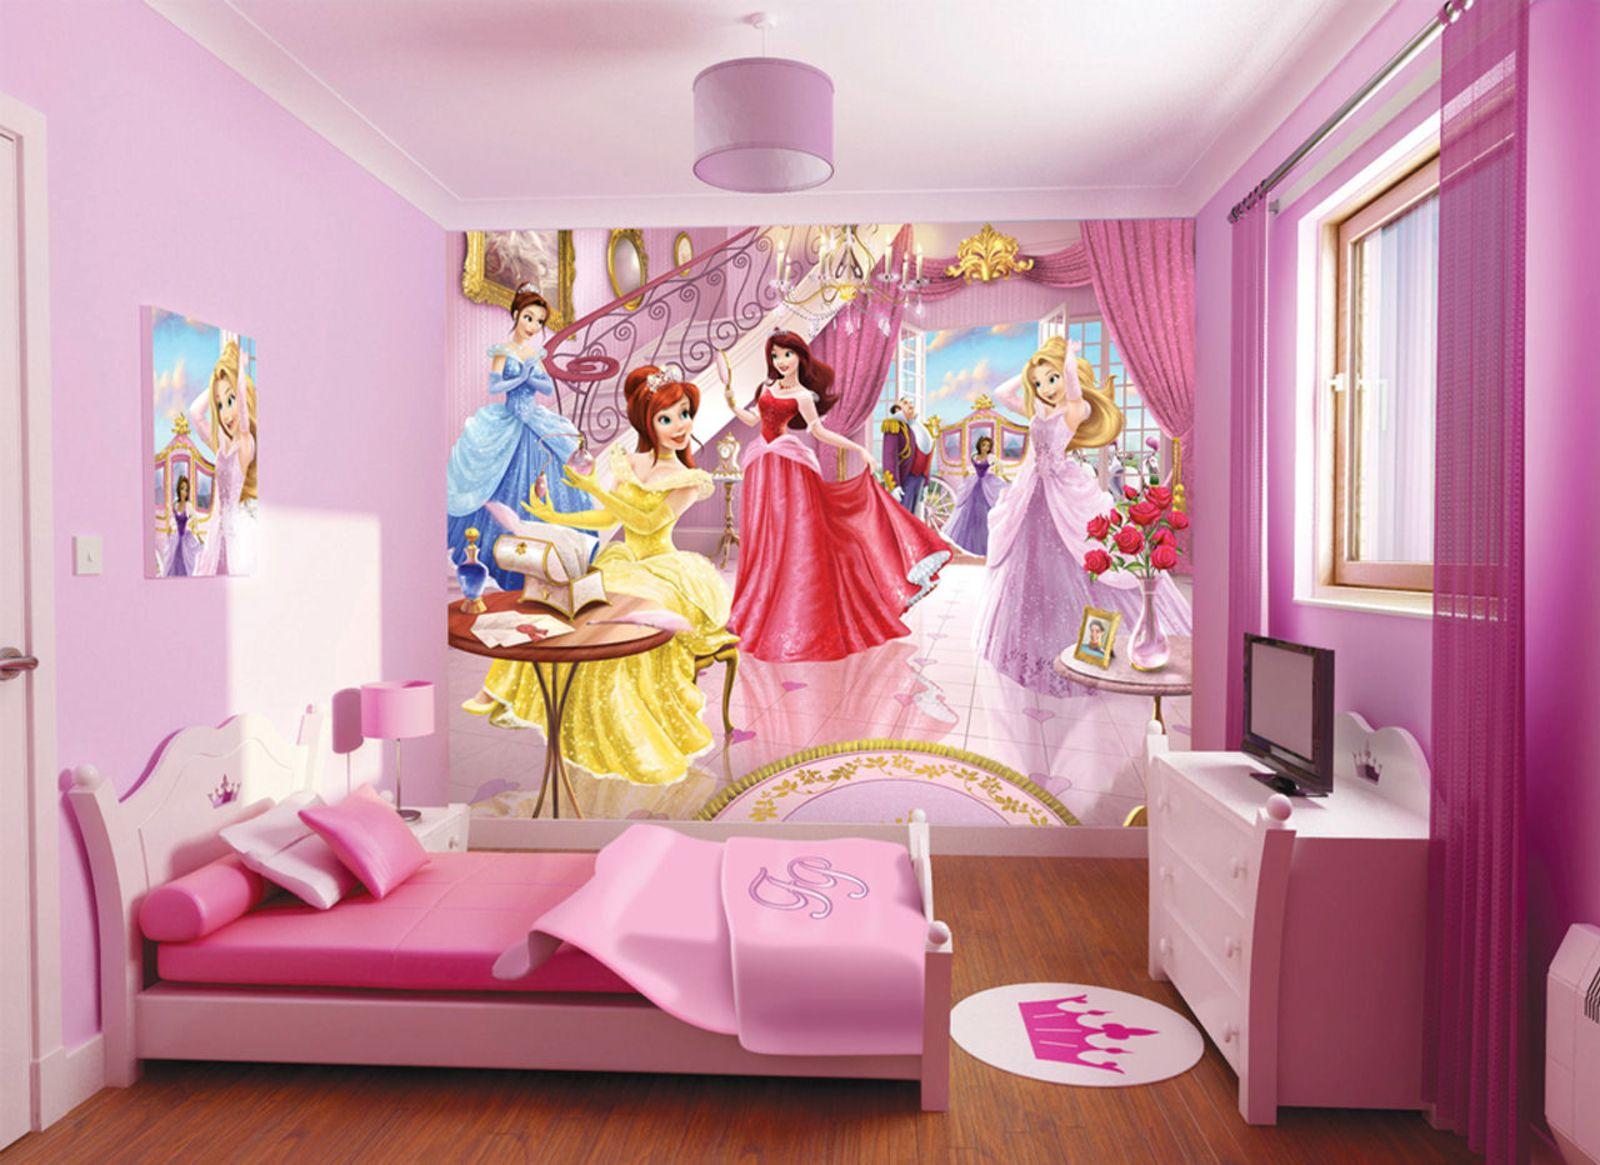 Decoracion Para Niños Www Decorartehogar Com Girls Room Wallpaper Kid Room Decor Kids Room Wallpaper